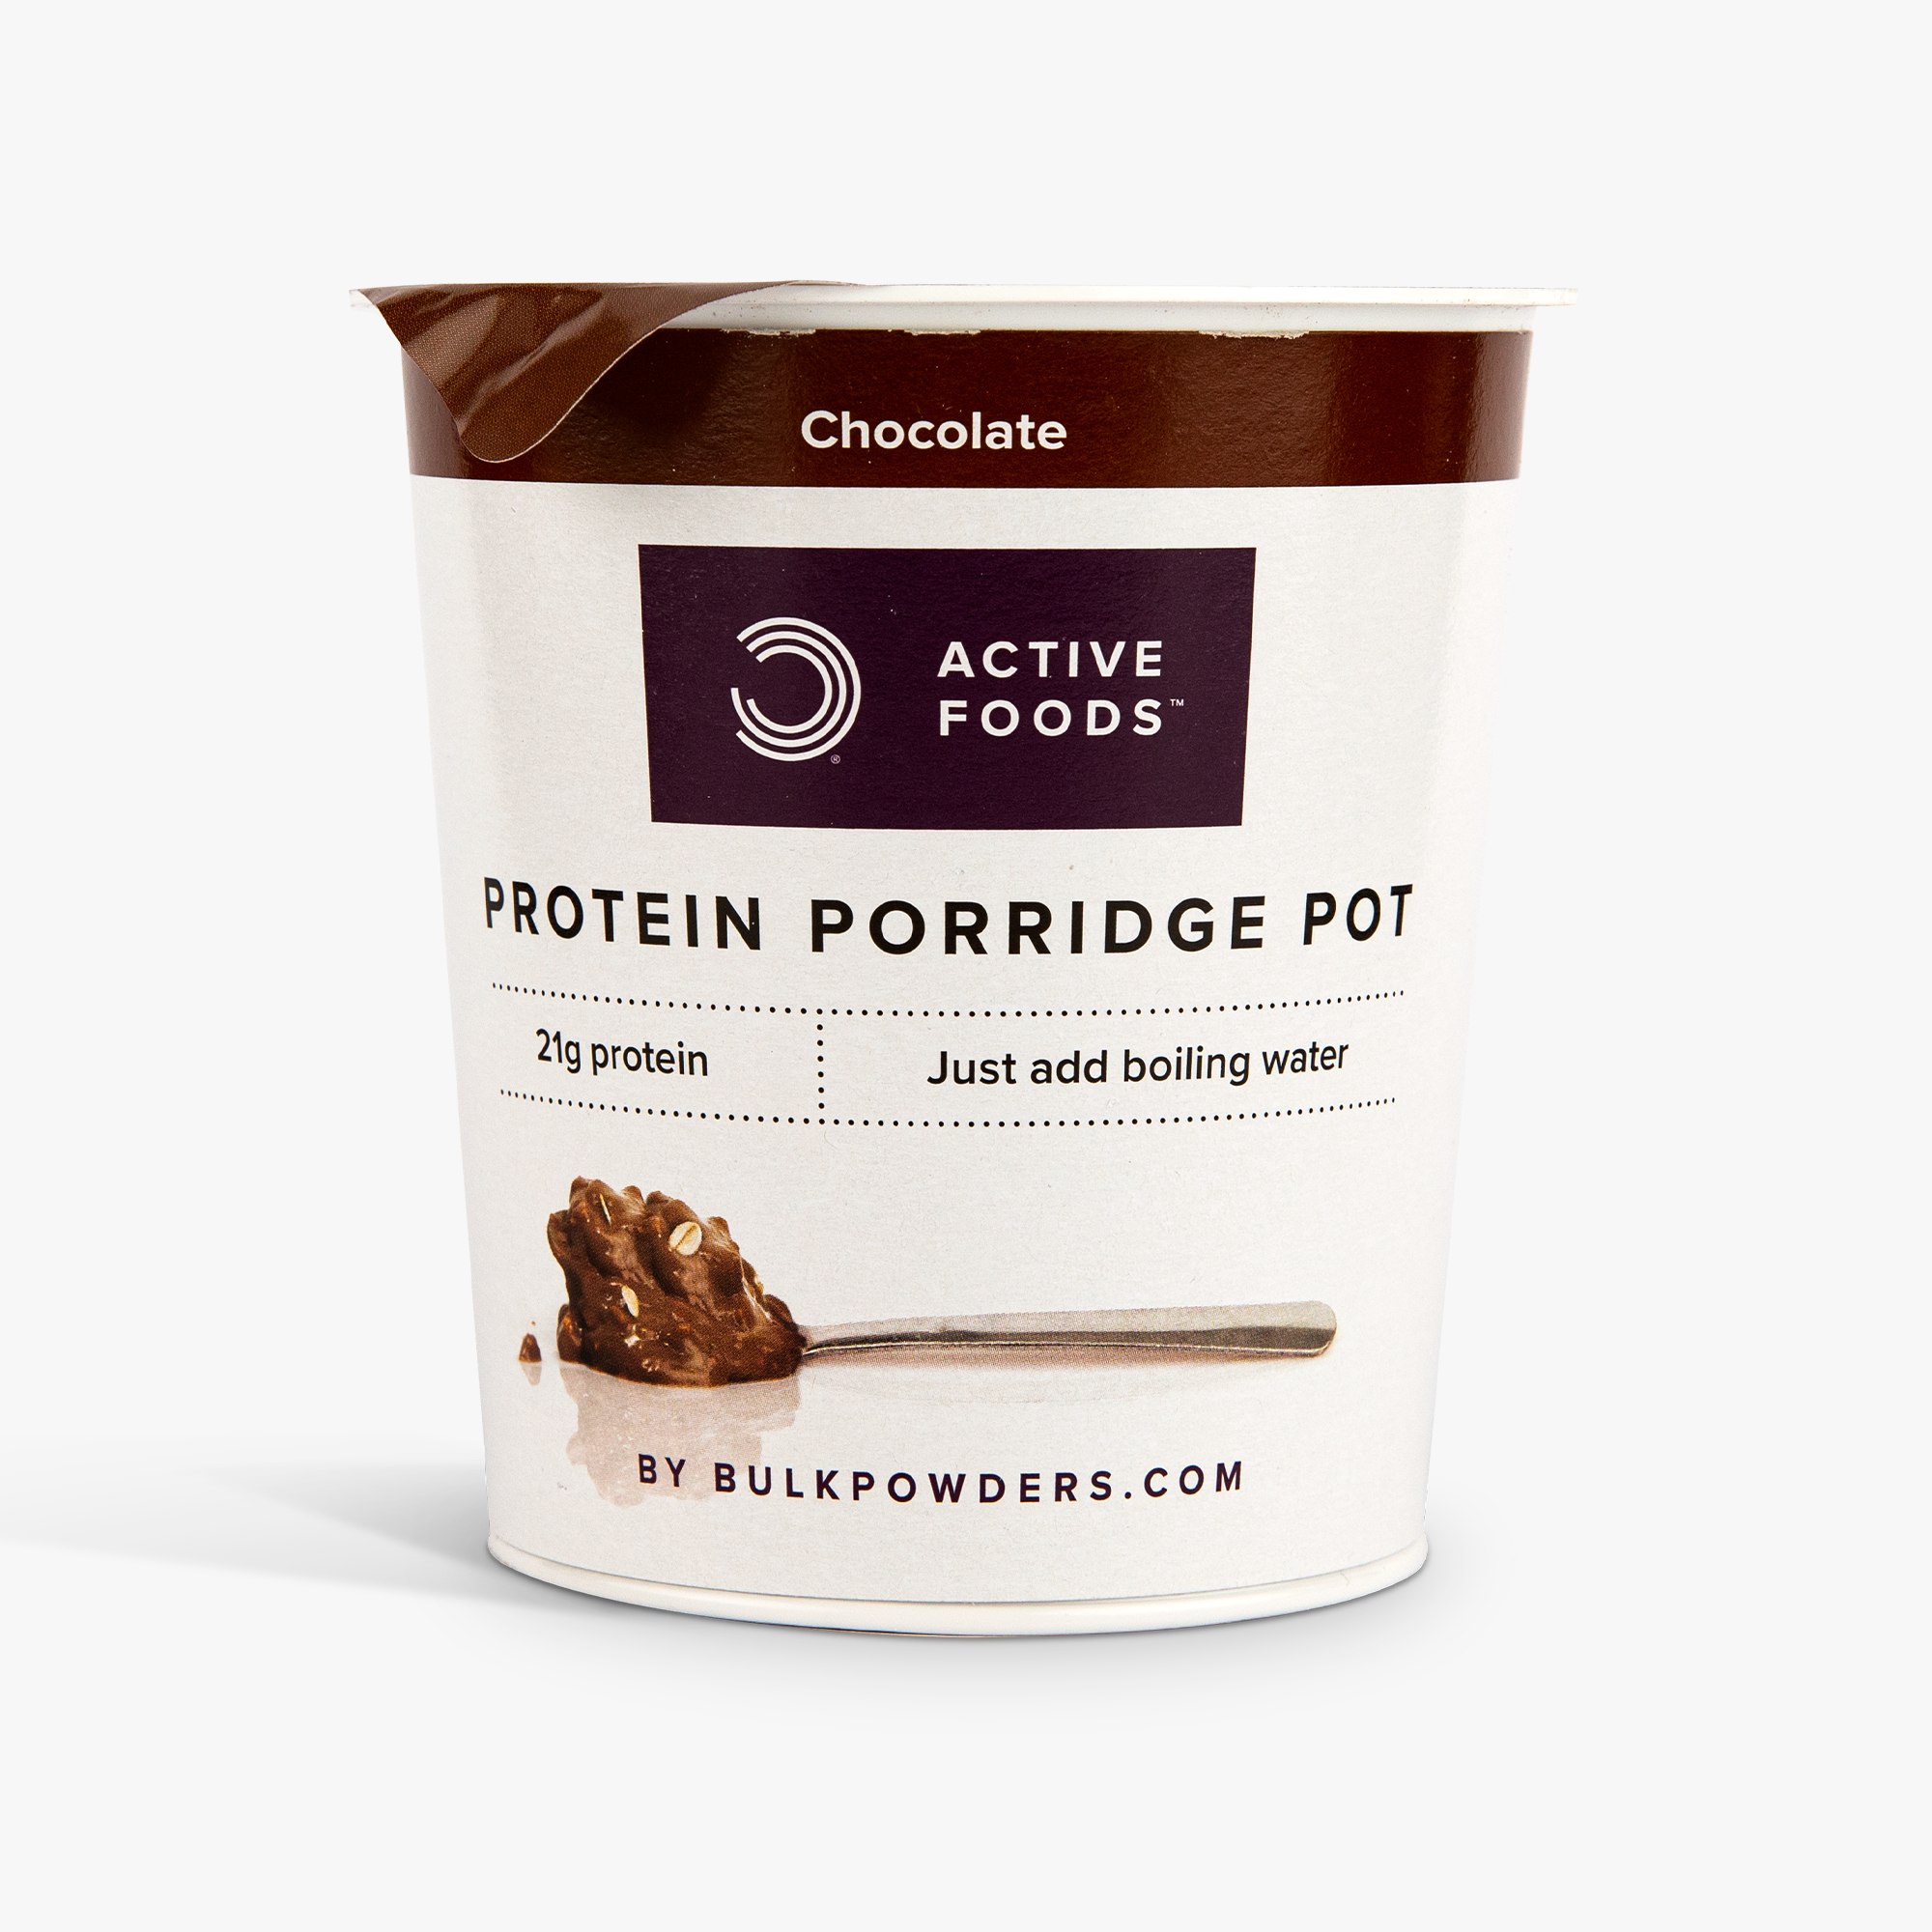 Image of Porridge proteico in vasetto